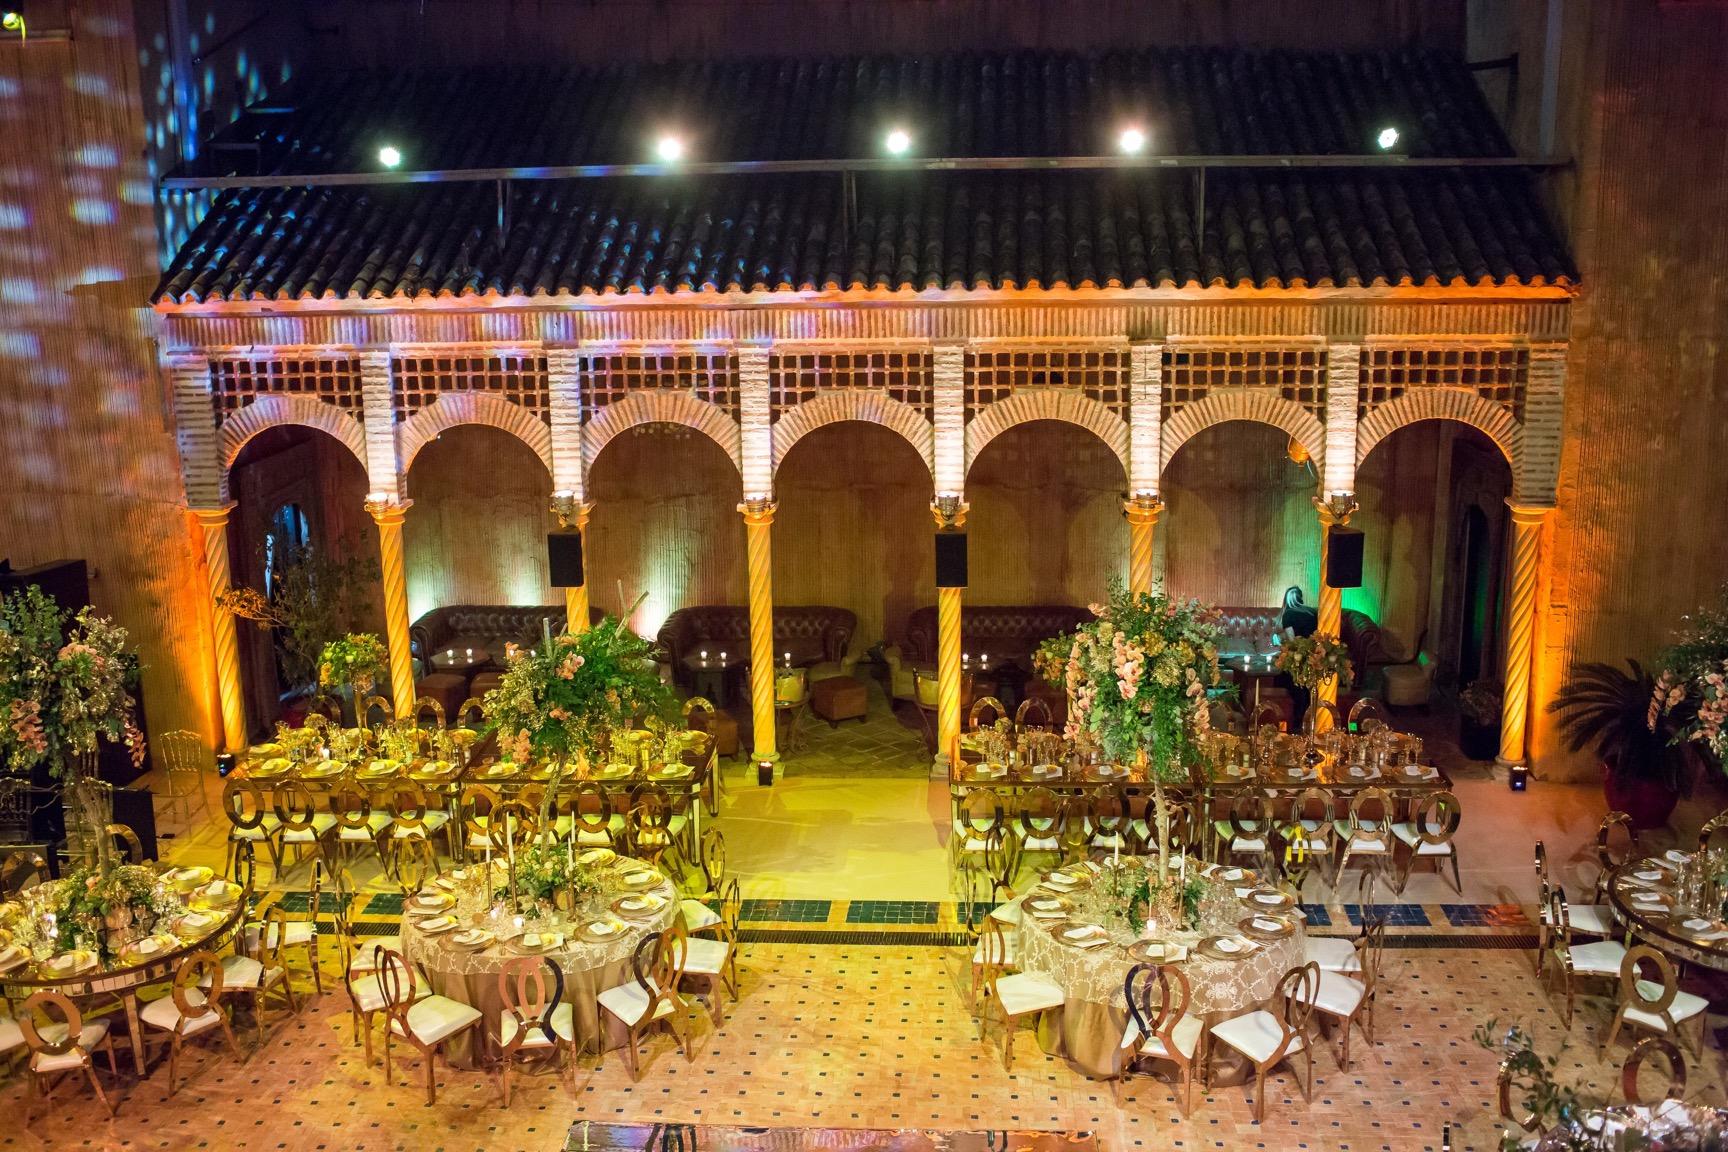 Si-Quiero-Wedding-Planner-By-Sira-Antequera-Bodas-Málaga-Marbella-Miami- L-A-39